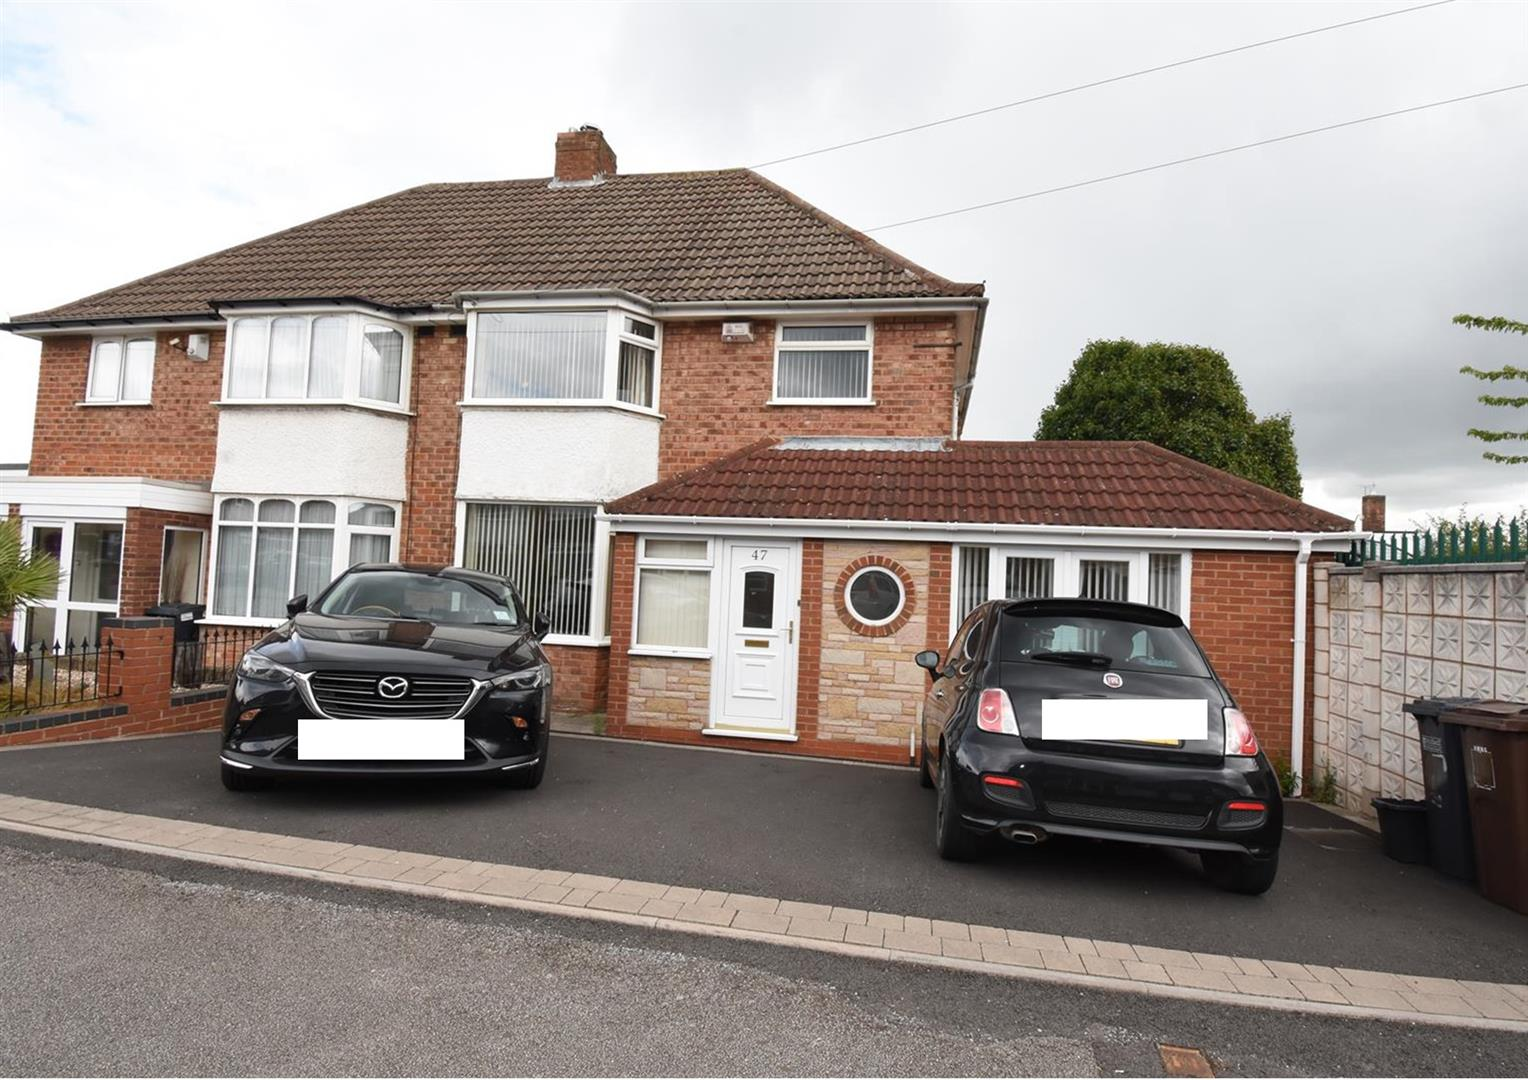 3 bed house for sale in Southfield Avenue, Castle Bromwich, Birmingham, B36